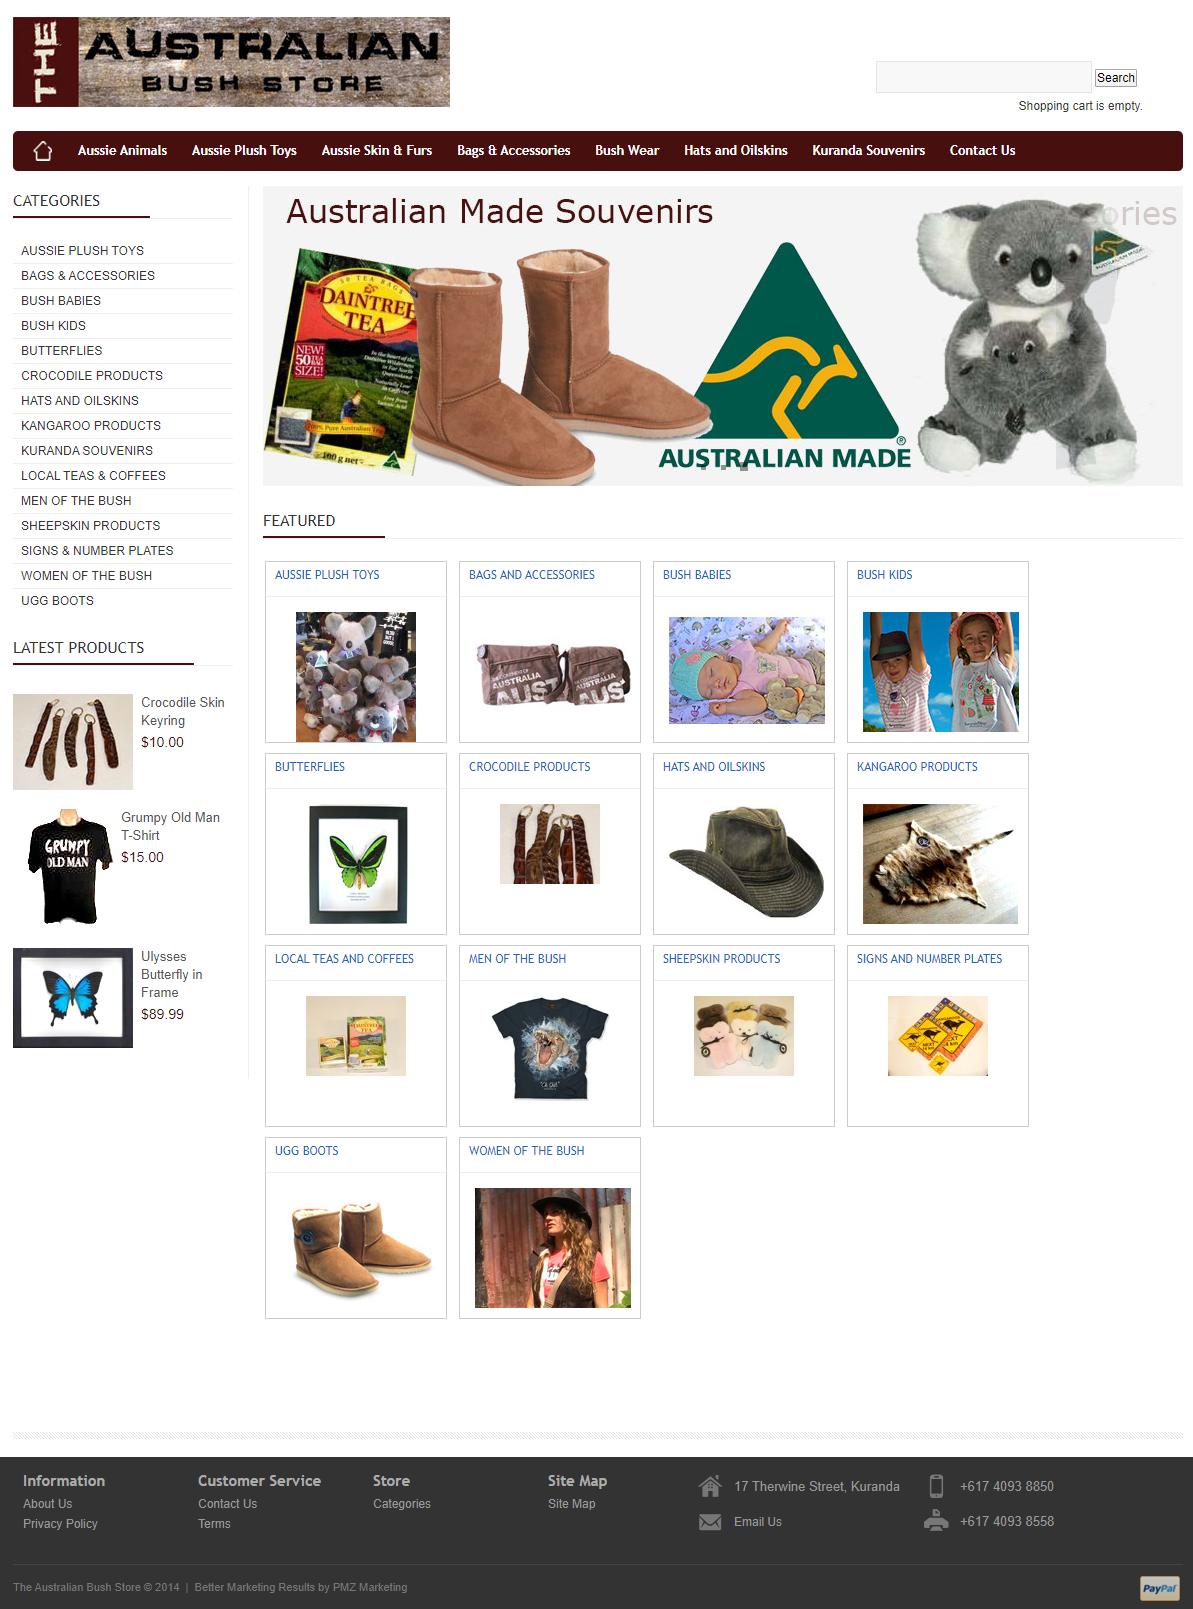 Australian Bush Store :: PMZ Marketing Client